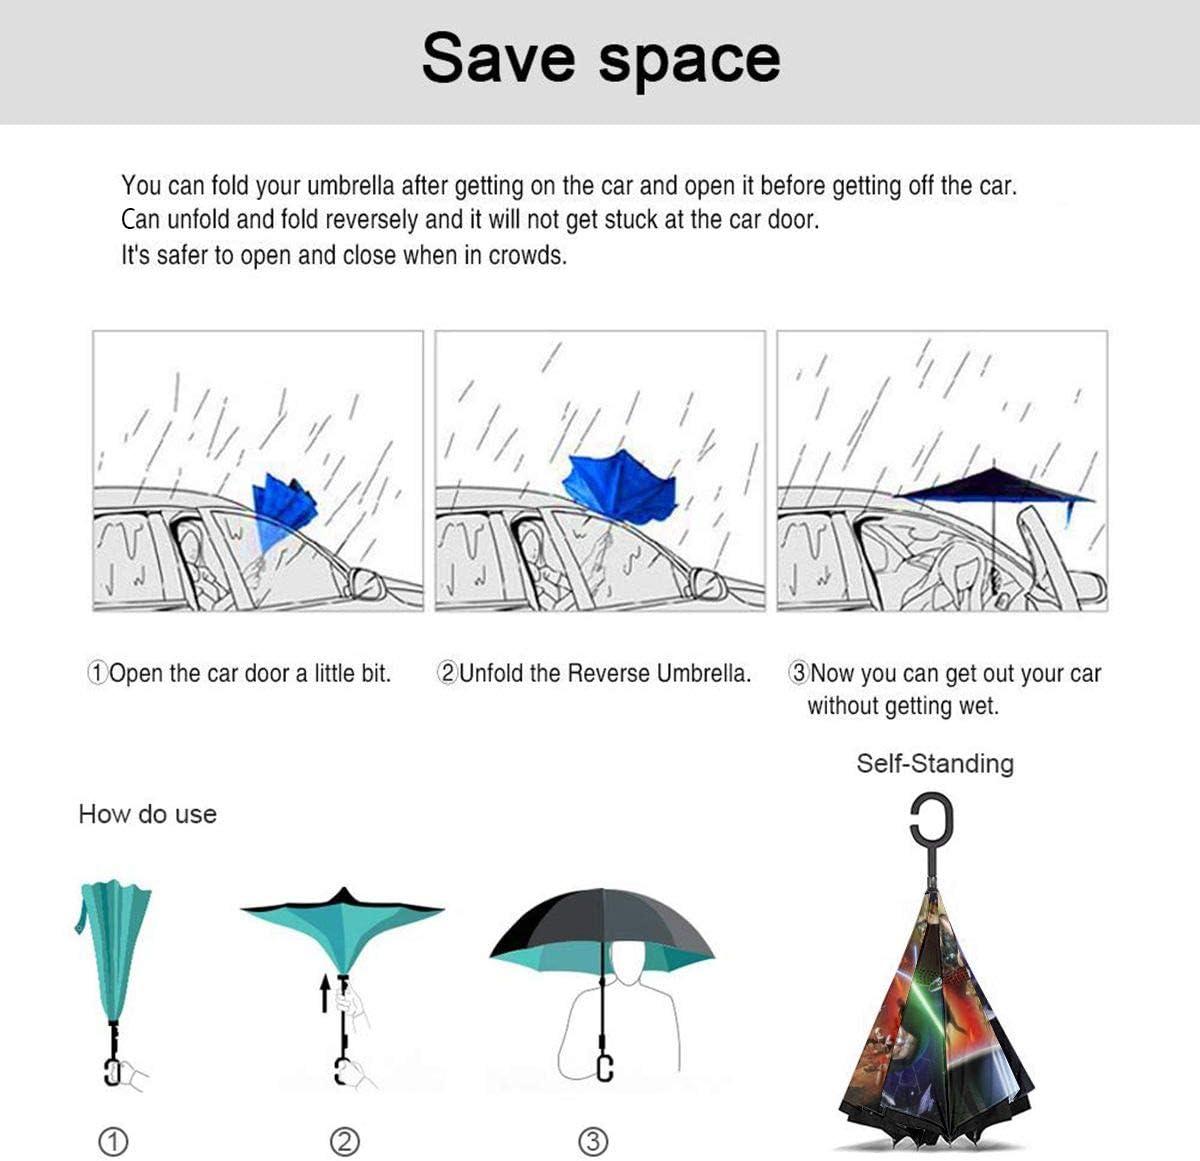 Naruto Car Reverse Umbrella Windproof And Rainproof Double Folding Inverted Umbrella With C-Shaped Handle UV Protection Inverted Folding Umbrellas